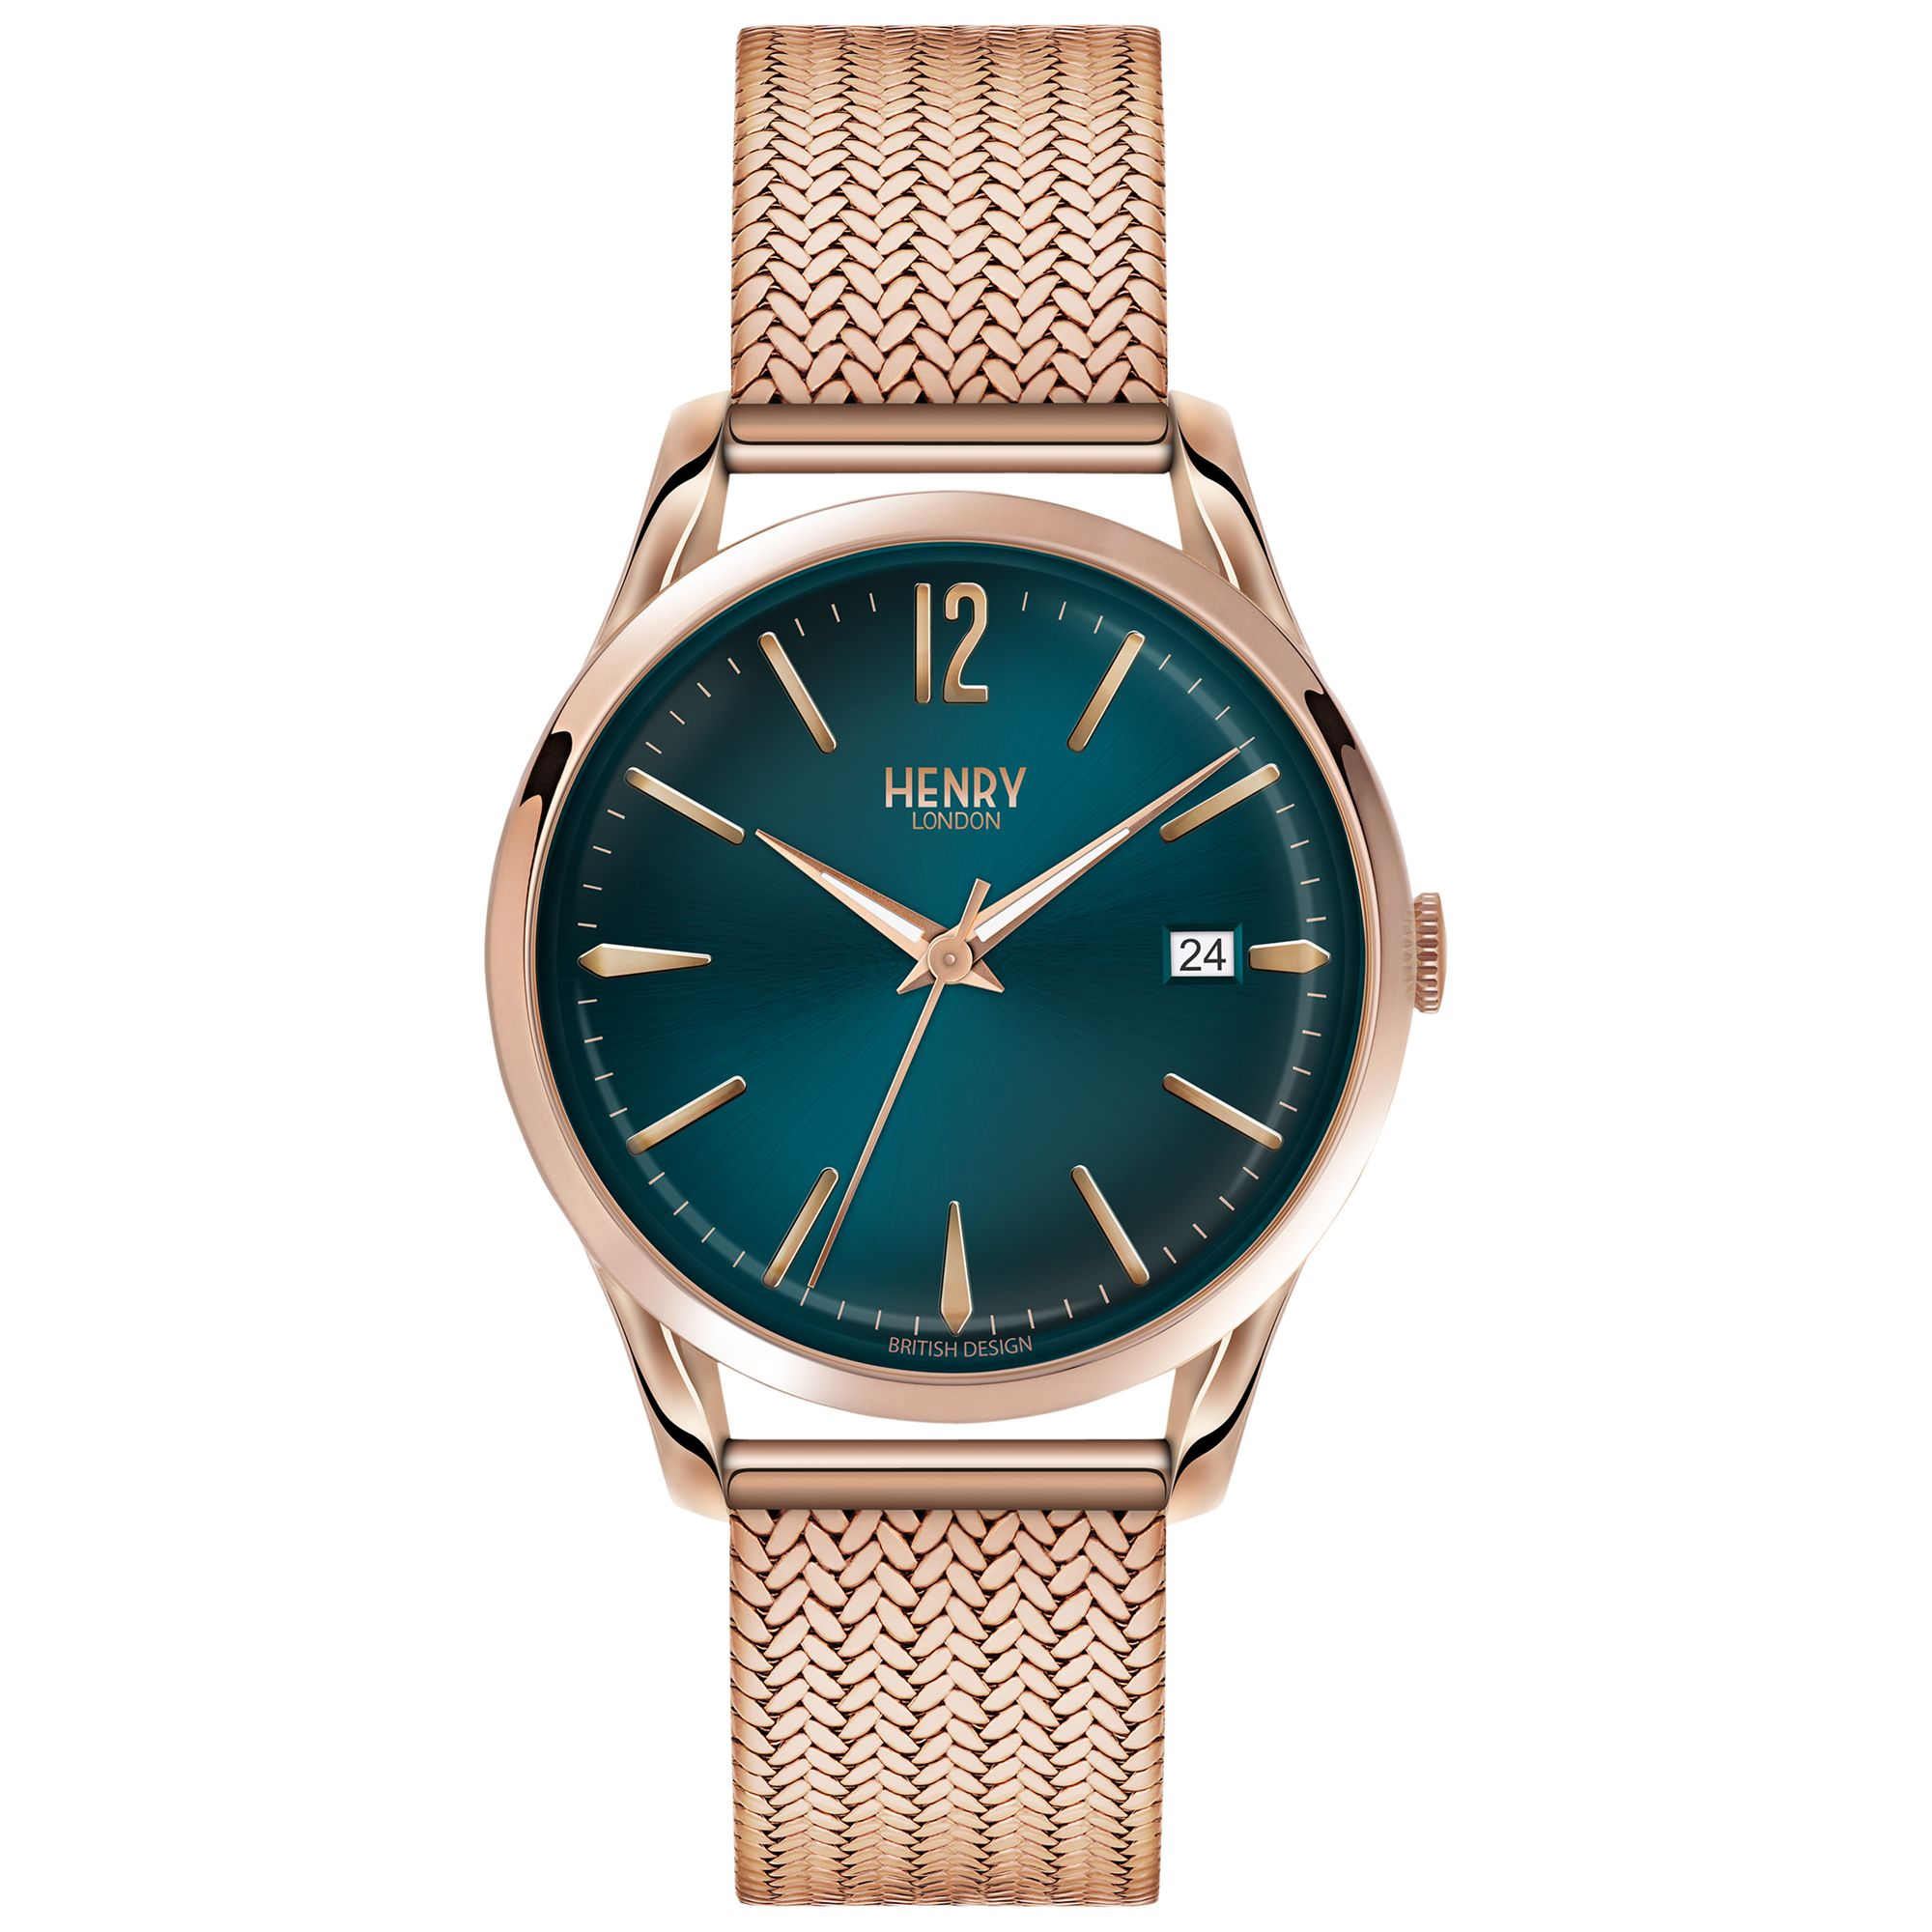 Henry London Henry London HL39-M-0136 Women's Stratford Date Bracelet Strap Watch, Rose Gold/Teal